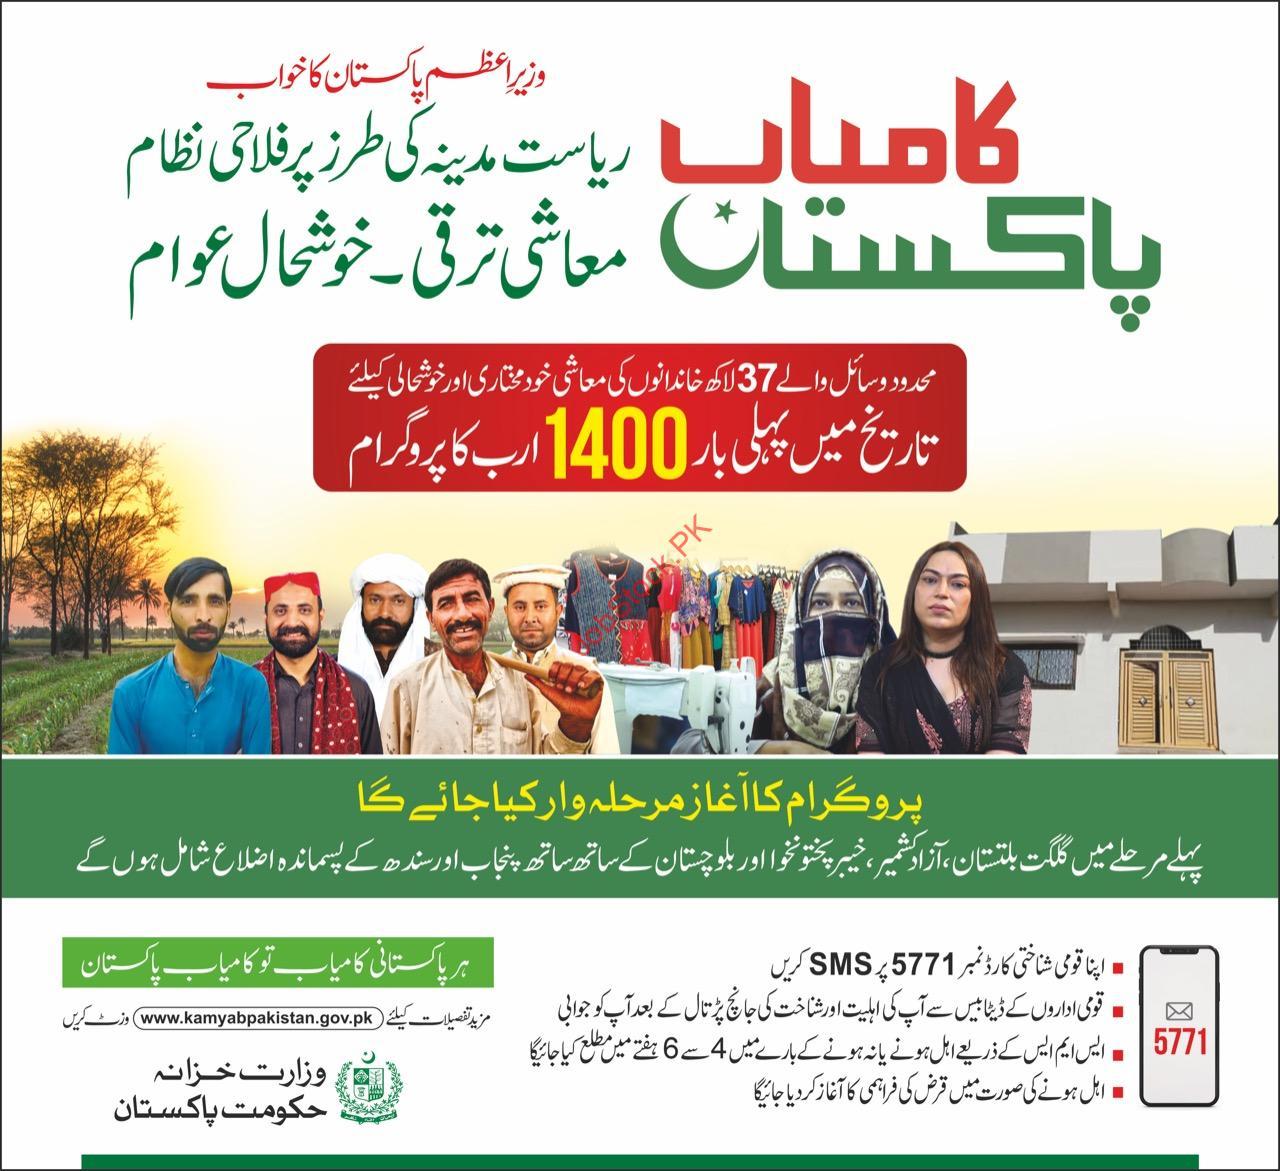 Kamyab Pakistan Program Online Registration